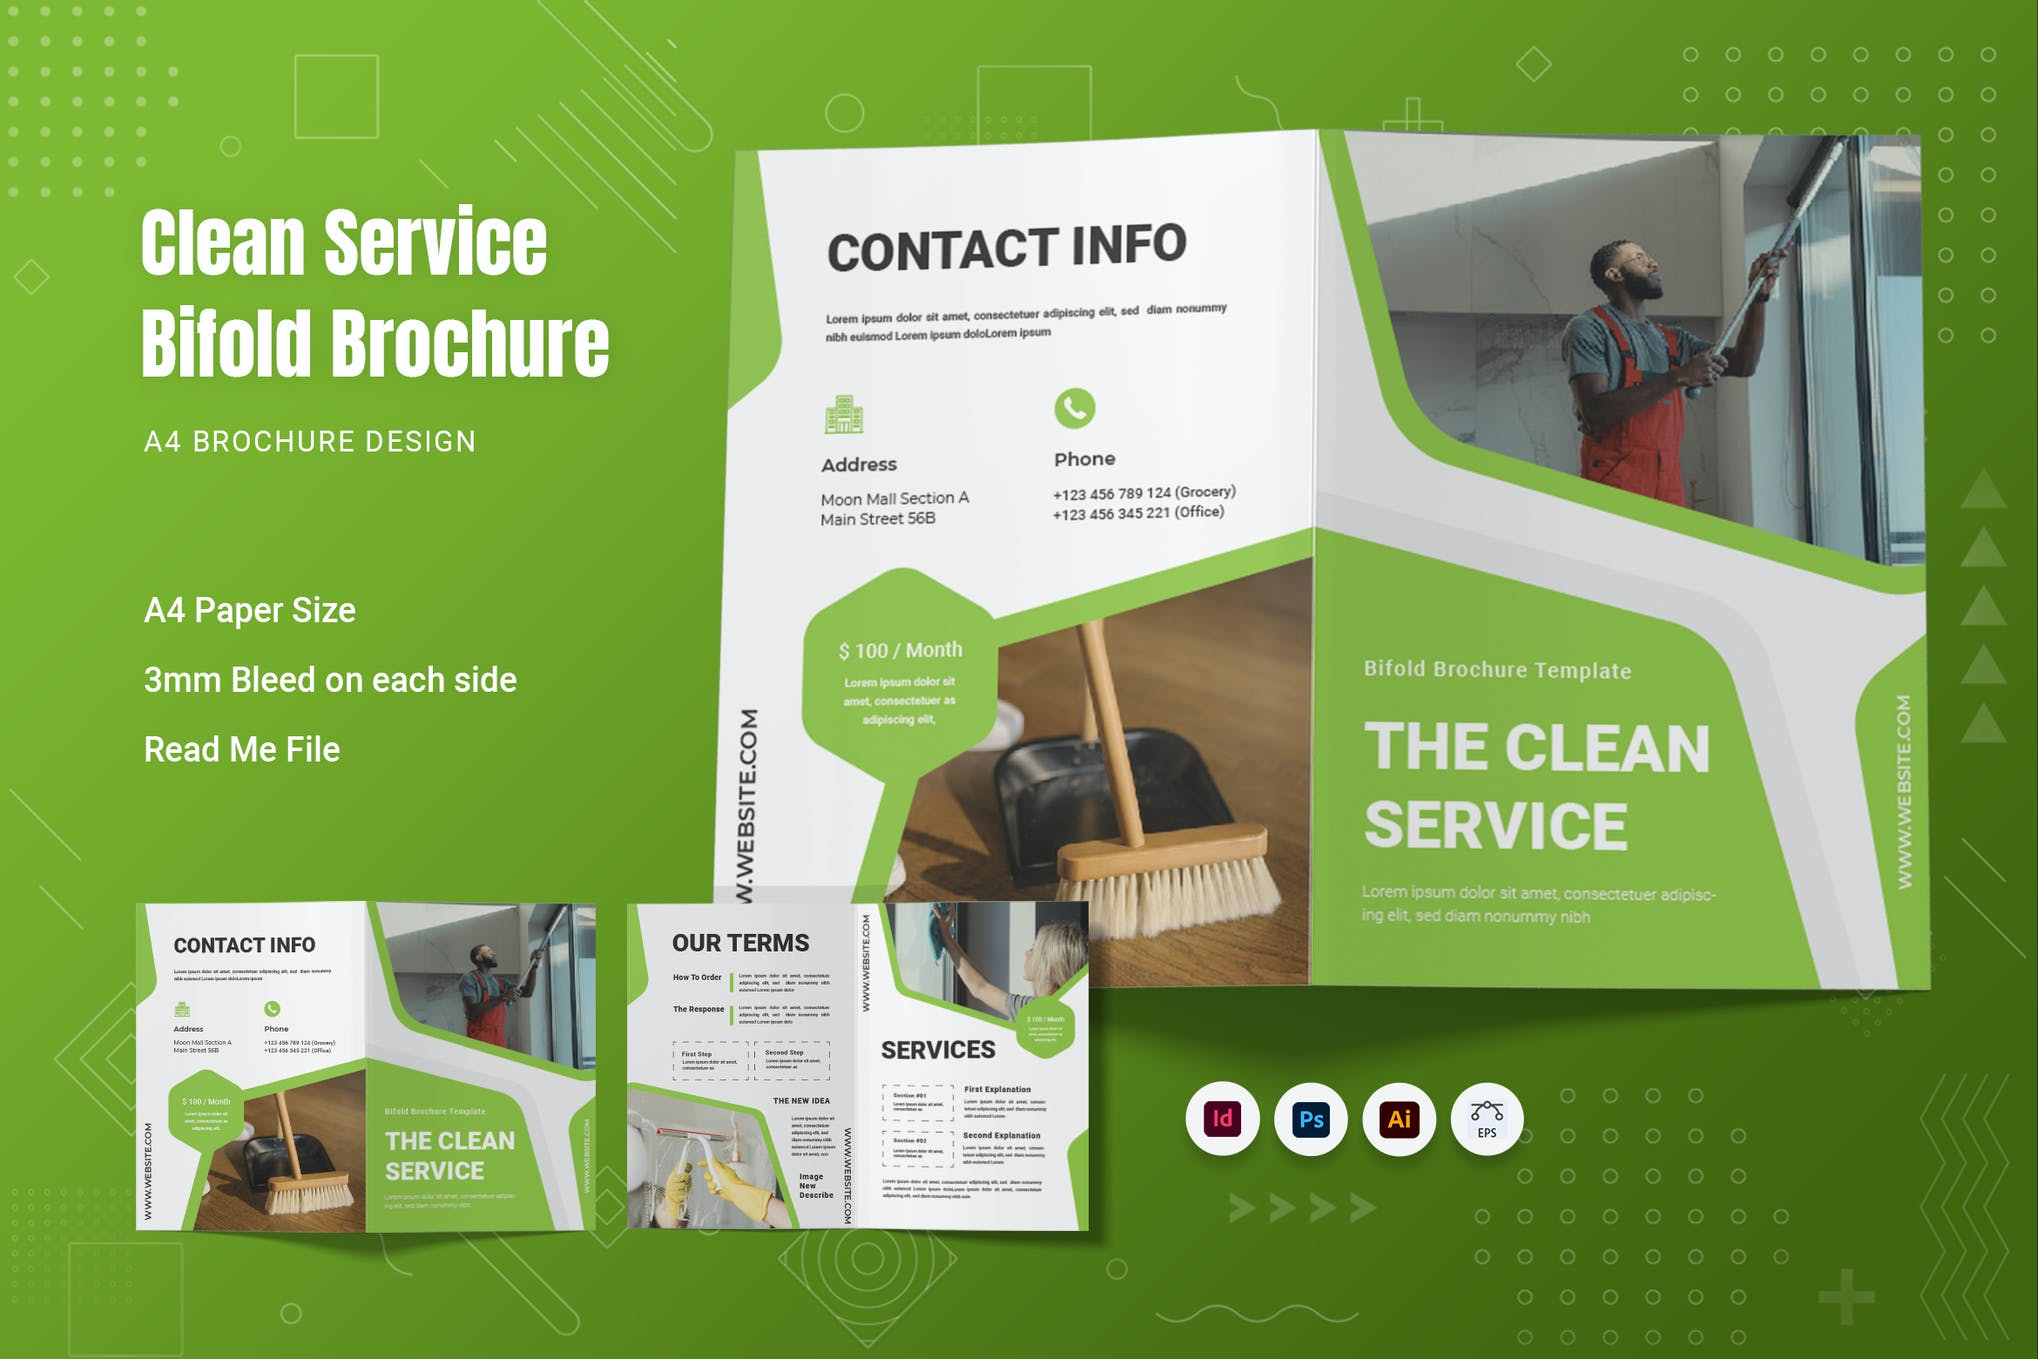 The Clean Service Bifold Brochure